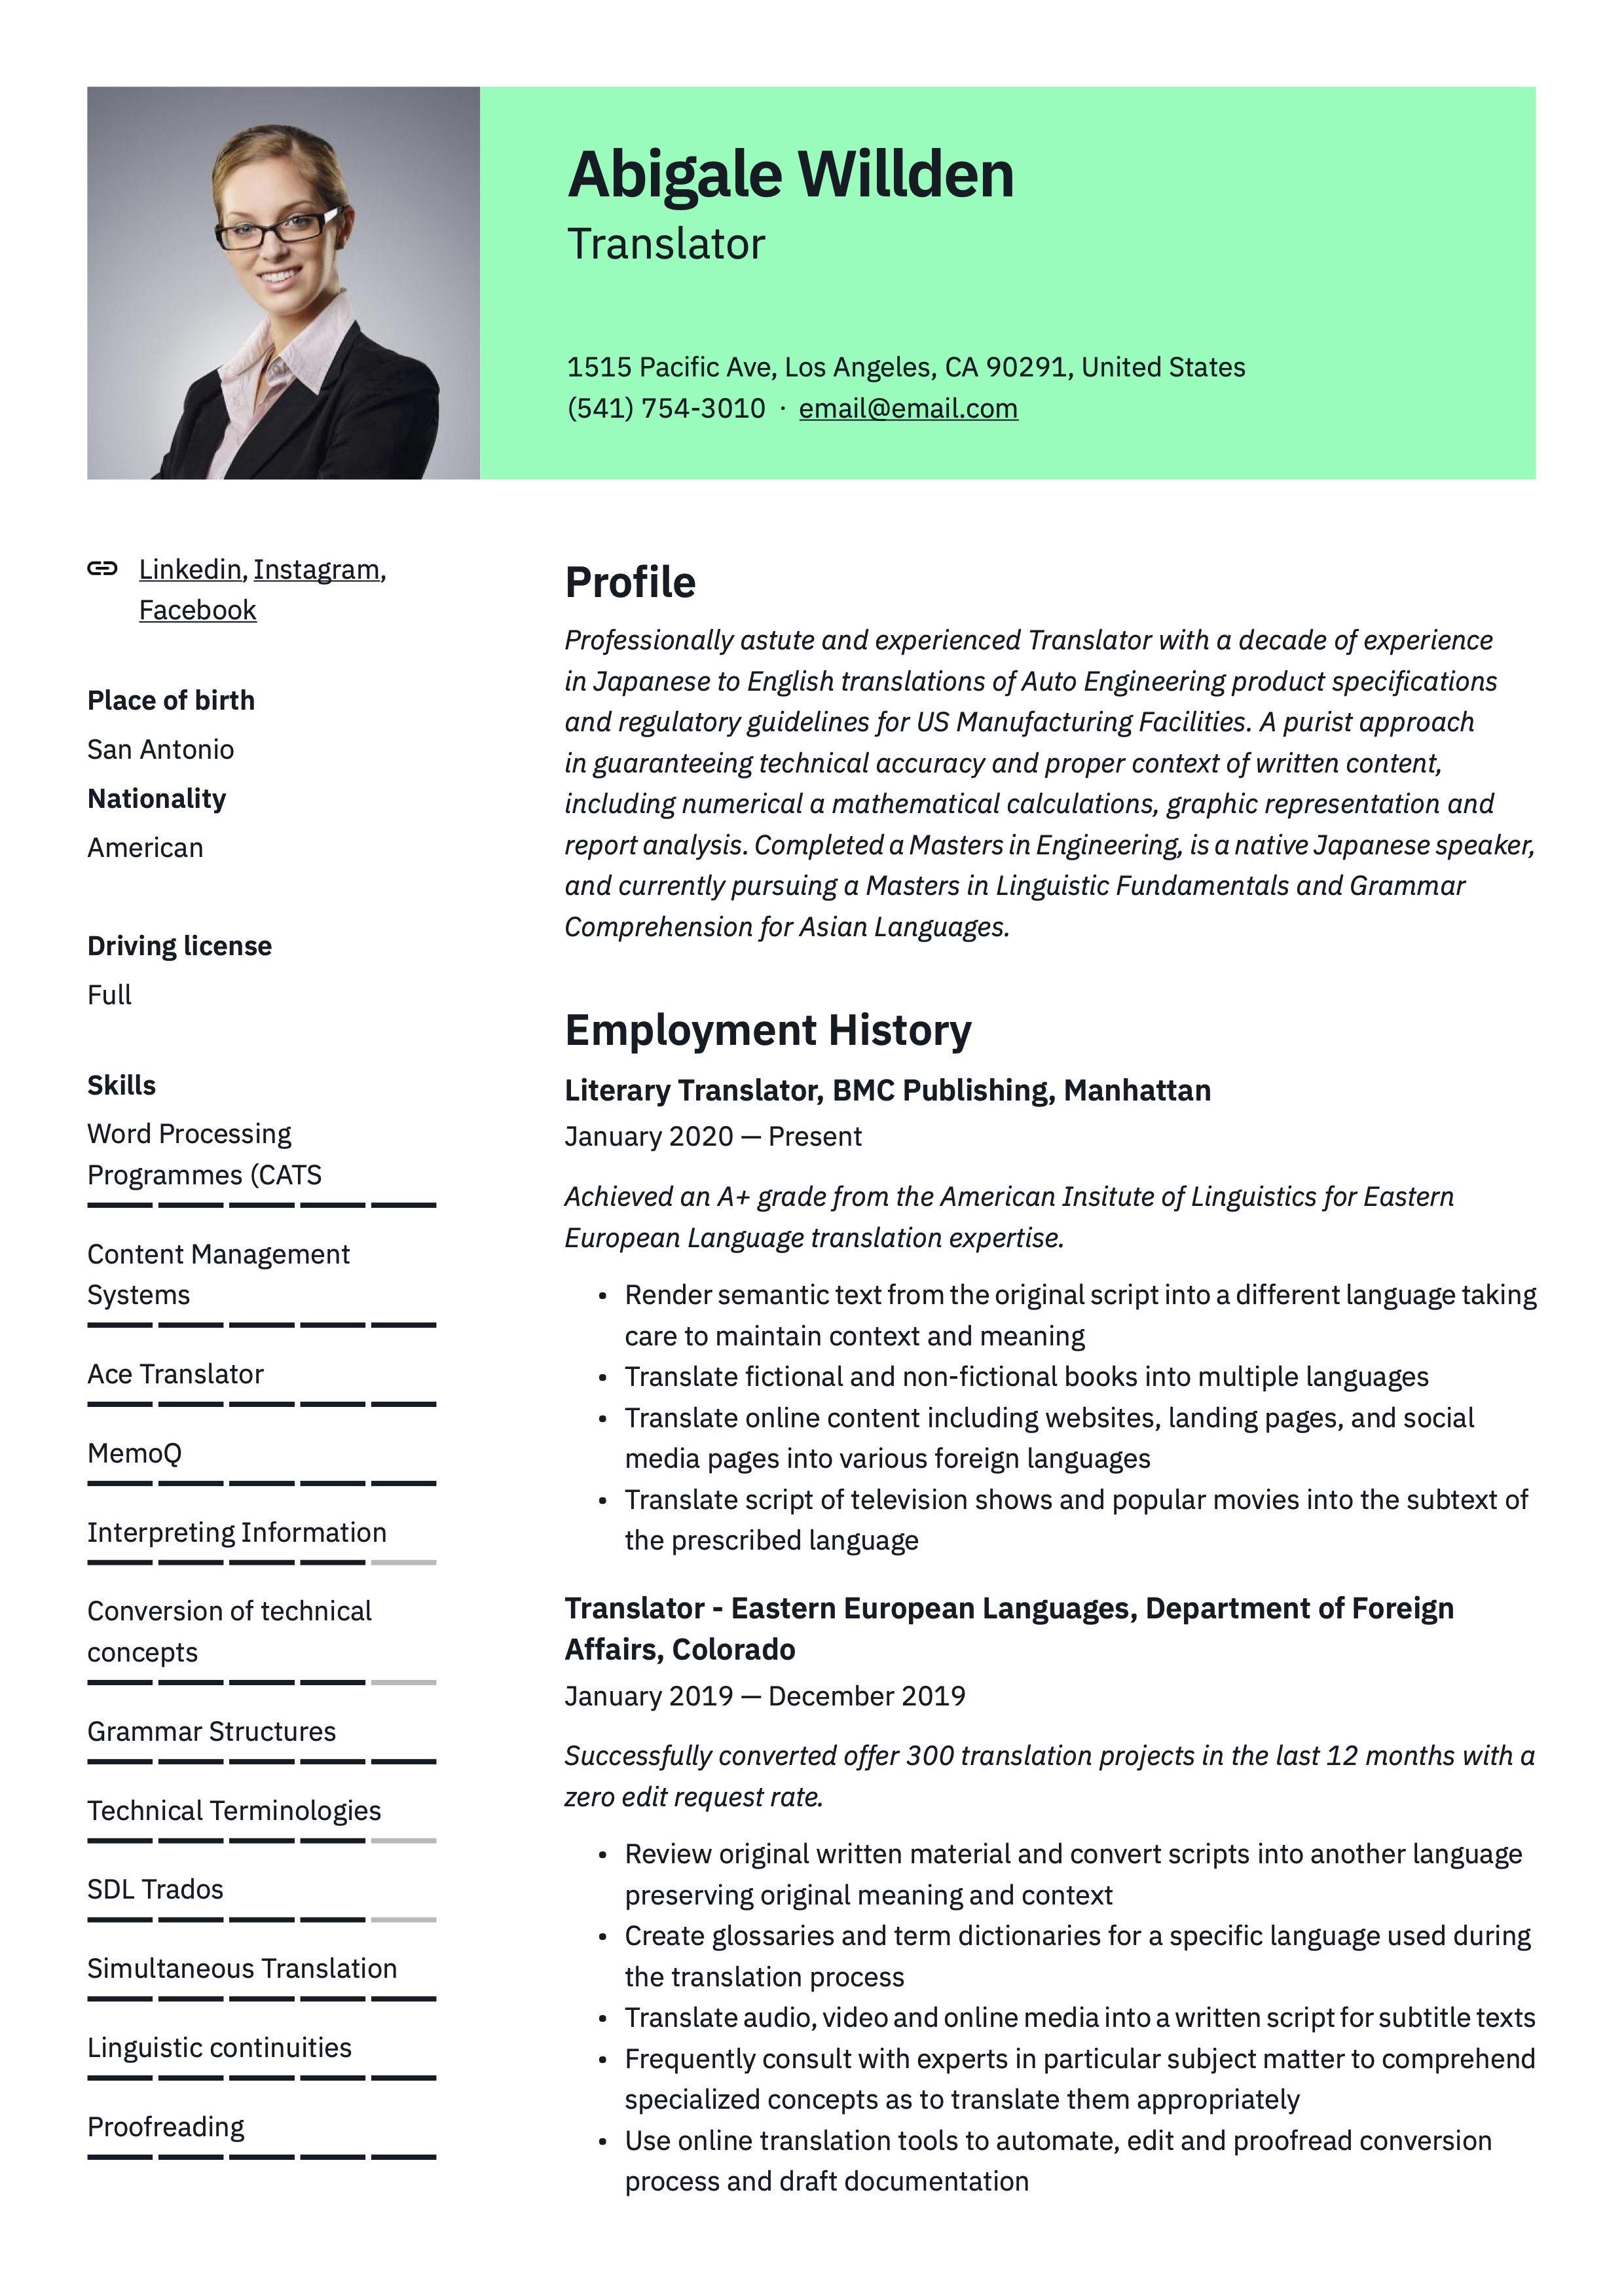 Traslator Resume Sample Guided Writing Resume Writing Resume